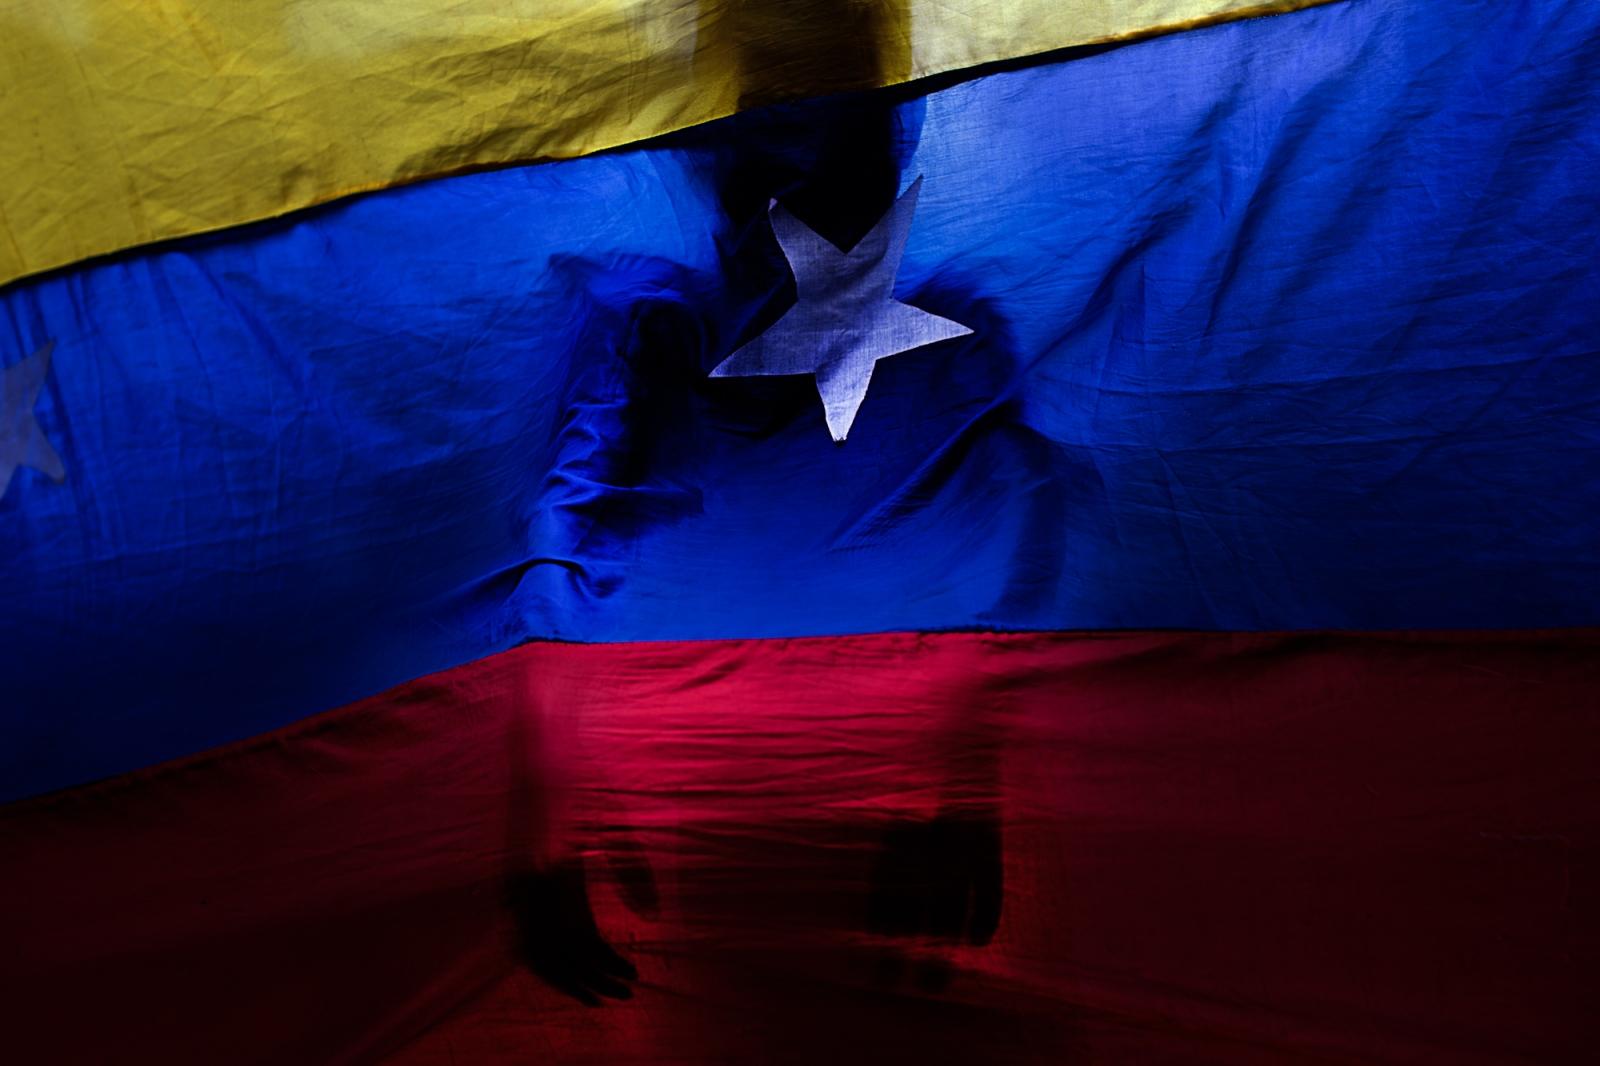 Art and Documentary Photography - Loading 020_VenezuelanUnrest_20170710_1300-Edit_Protestas.jpg